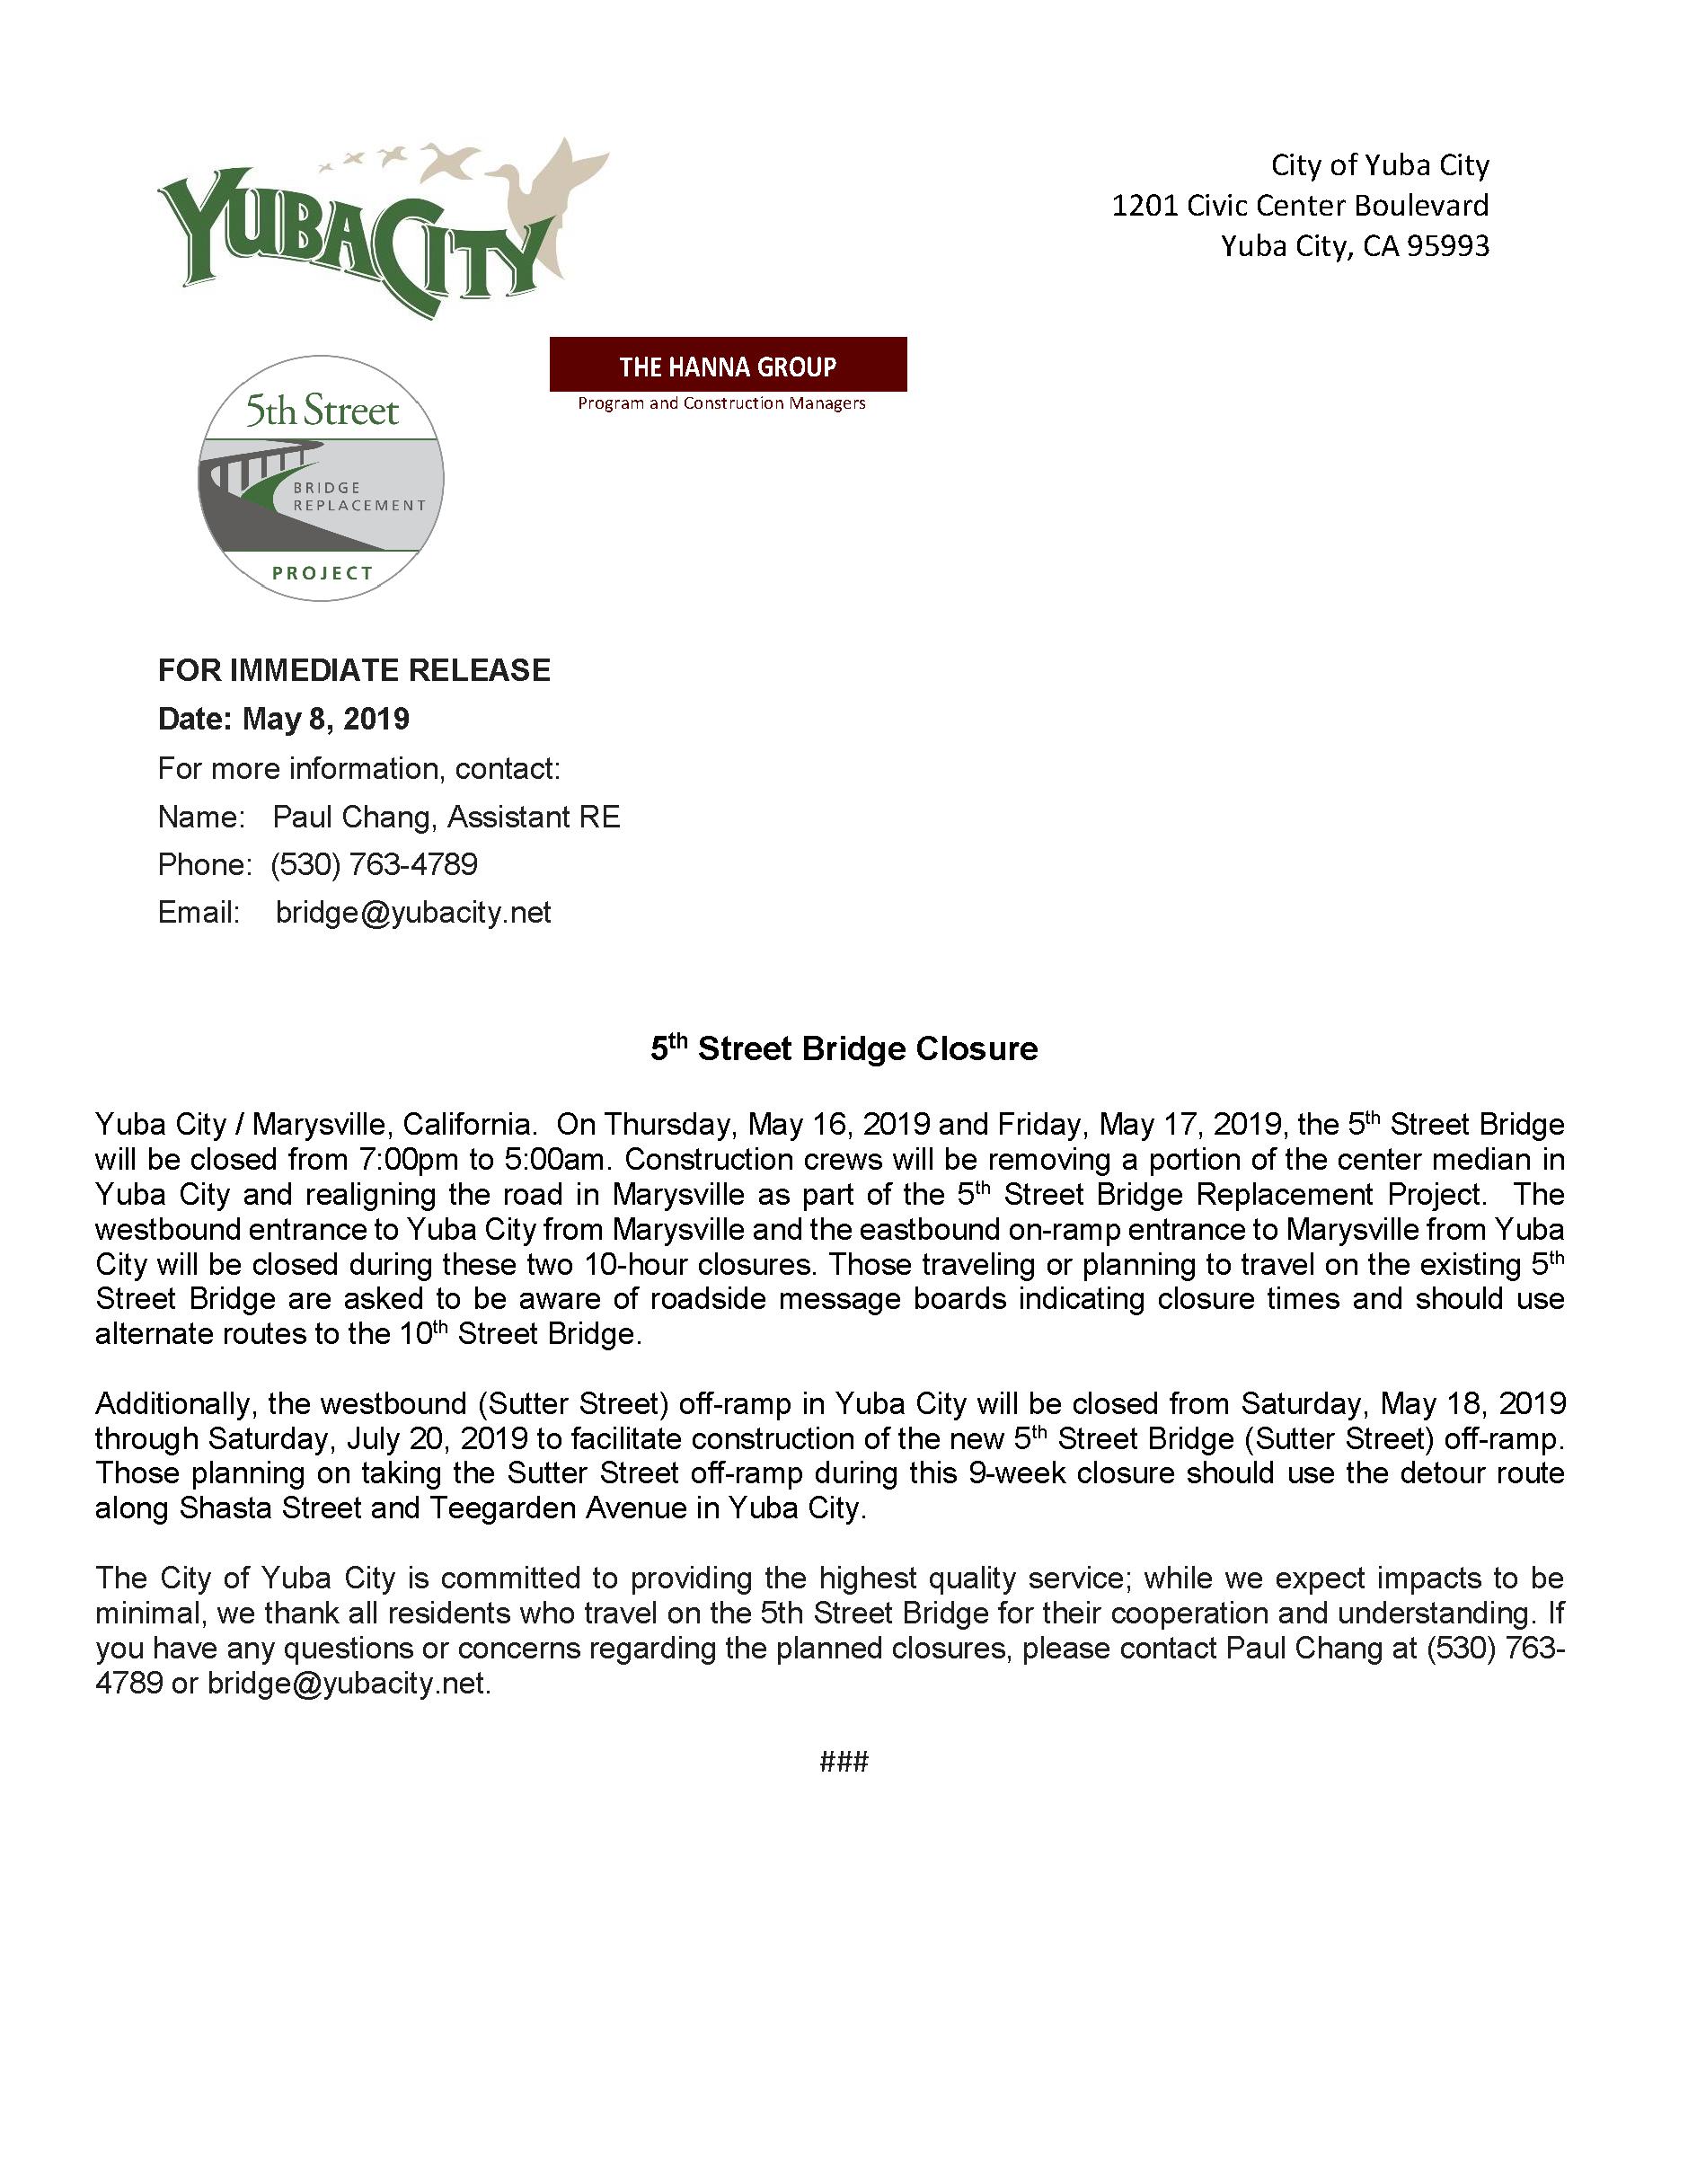 Press Release - 5th St Bridge Closure May 2019.png